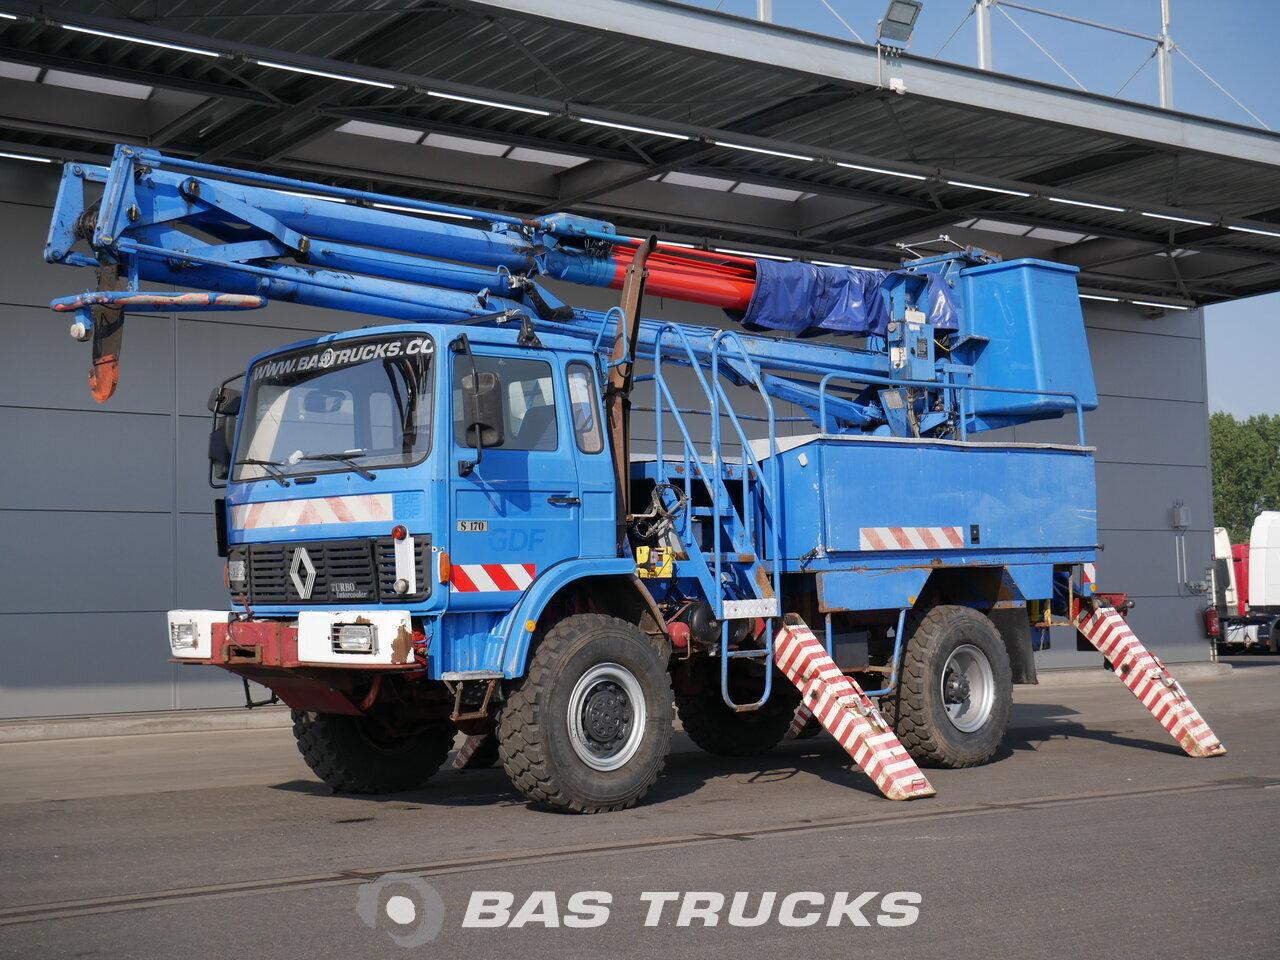 photo de Occasion Camion Renault S170 Platform truck, Arbeitsbuhne 4X4 1991